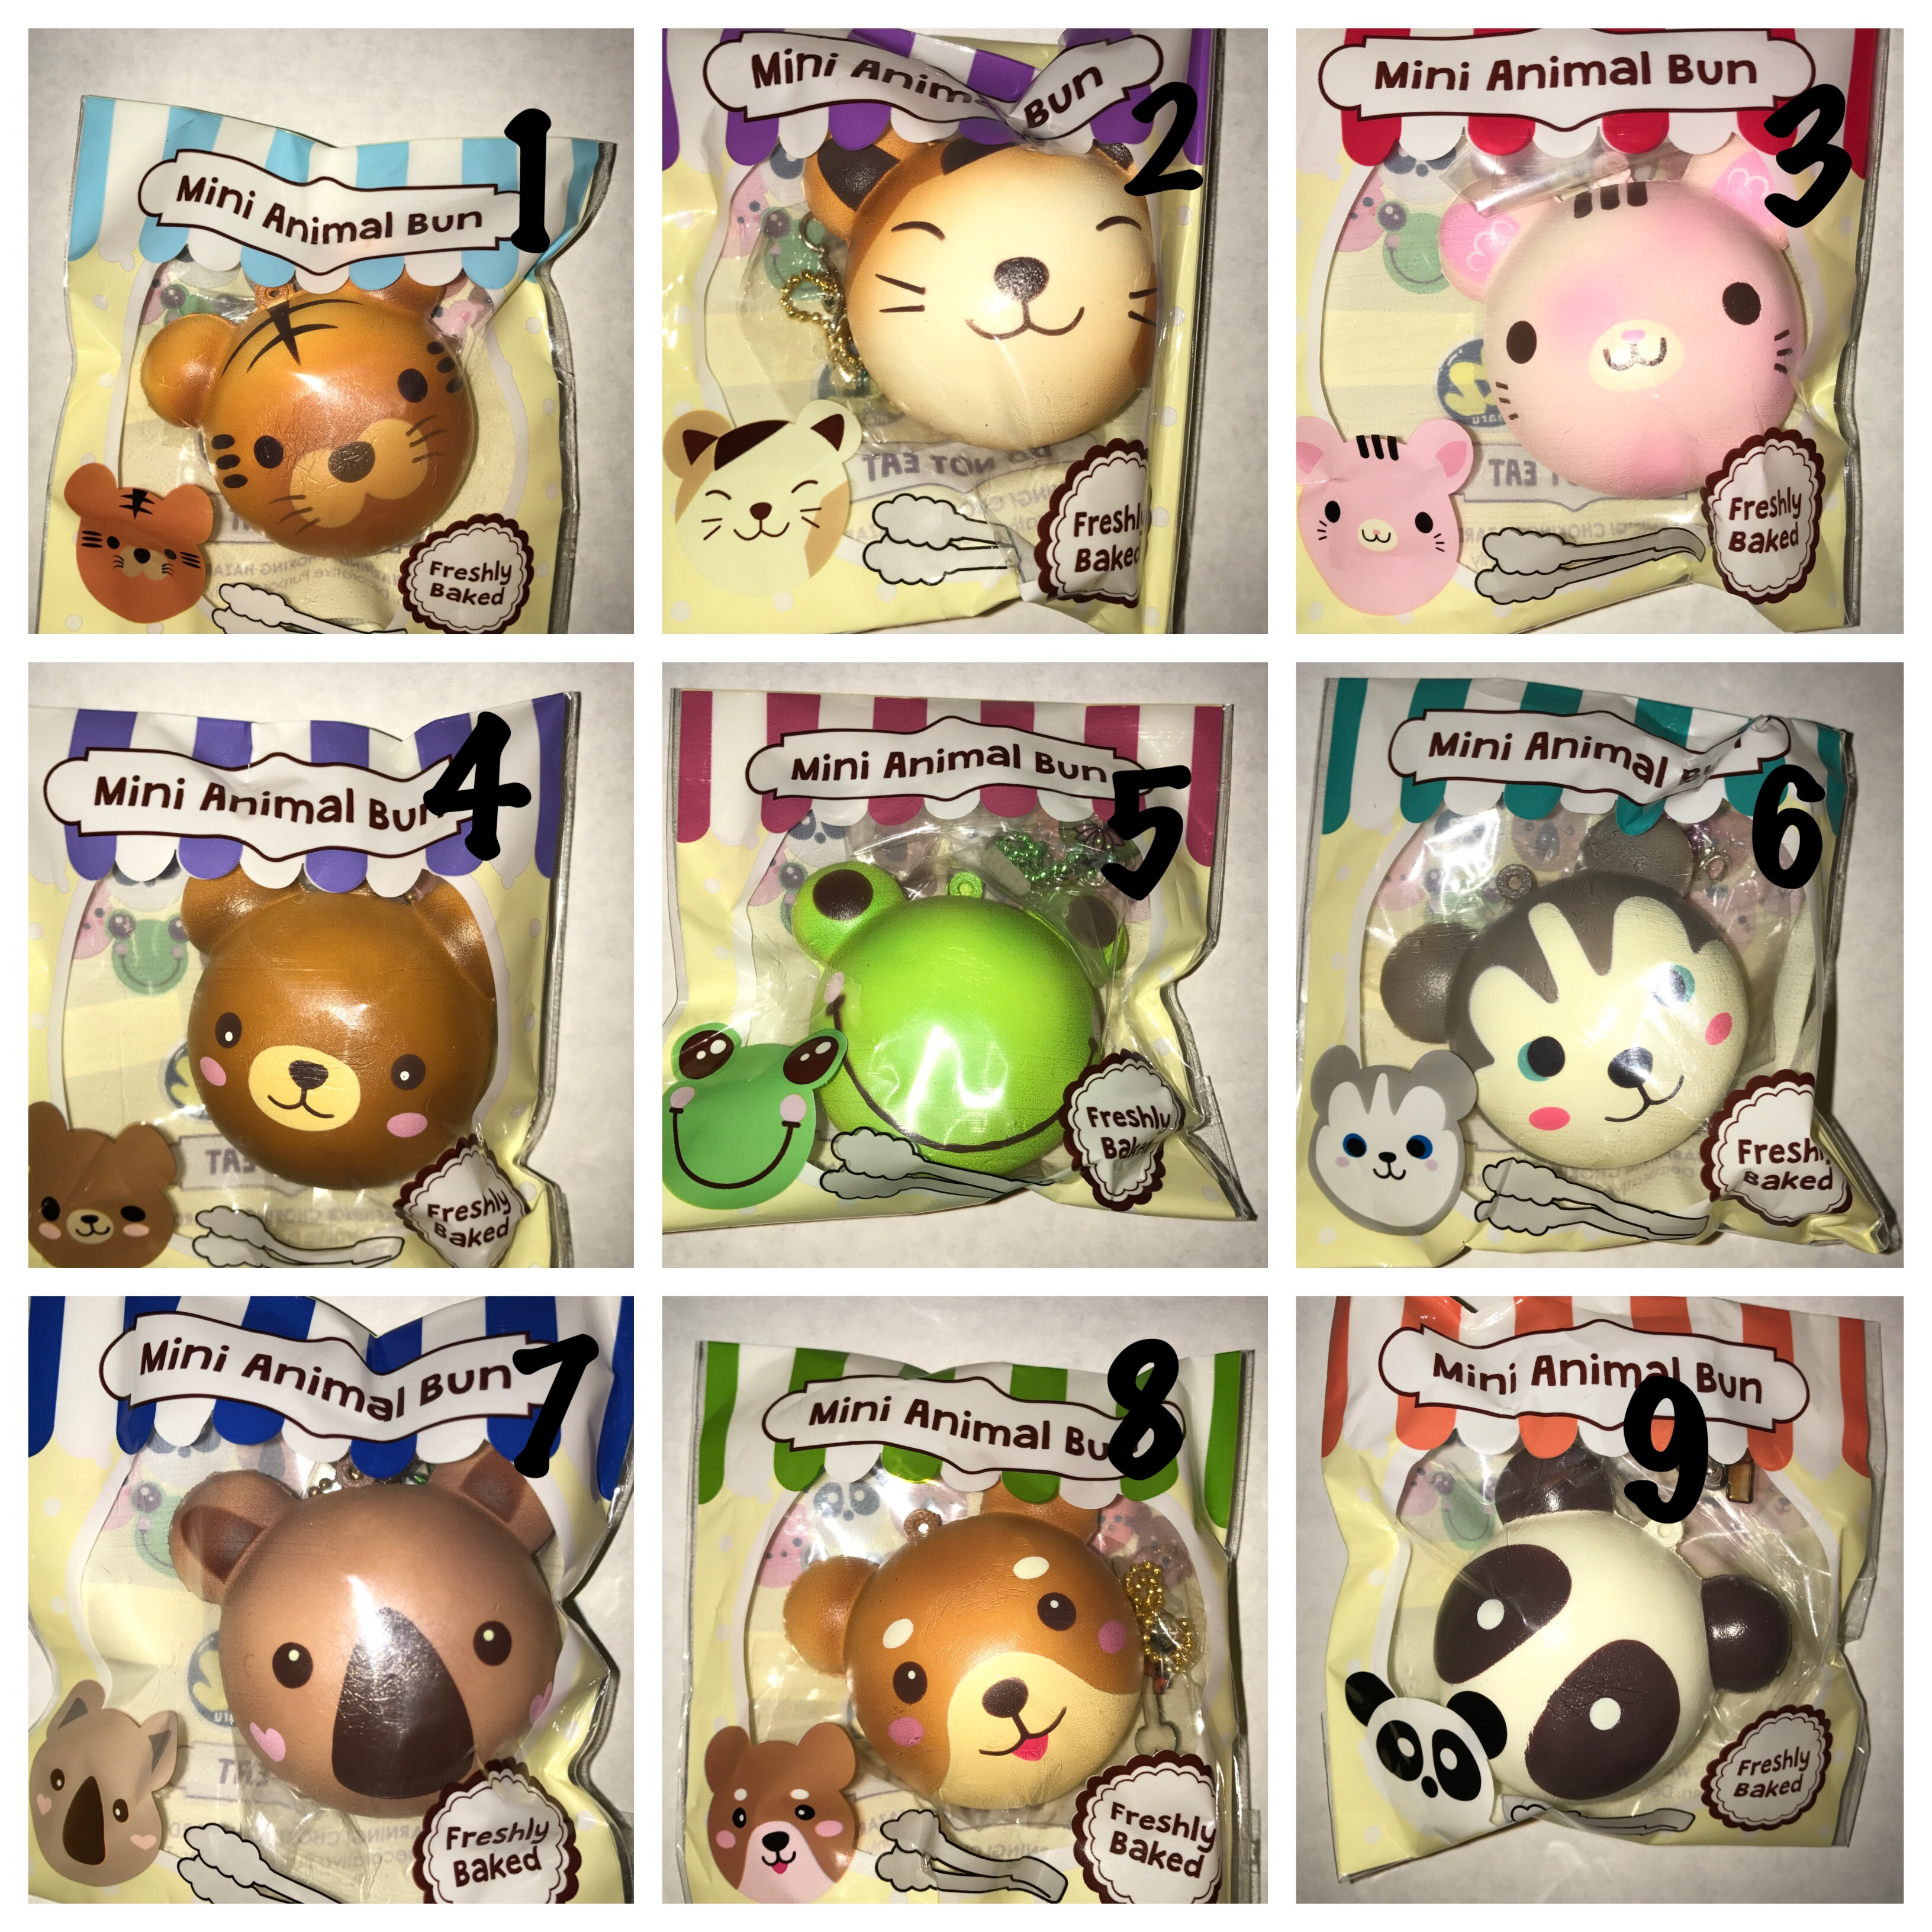 Squishy Animal Buns : Puni Maru Mini Animal Bun Squishy ? Ilovesquishies803 ? Online Store Powered by Storenvy